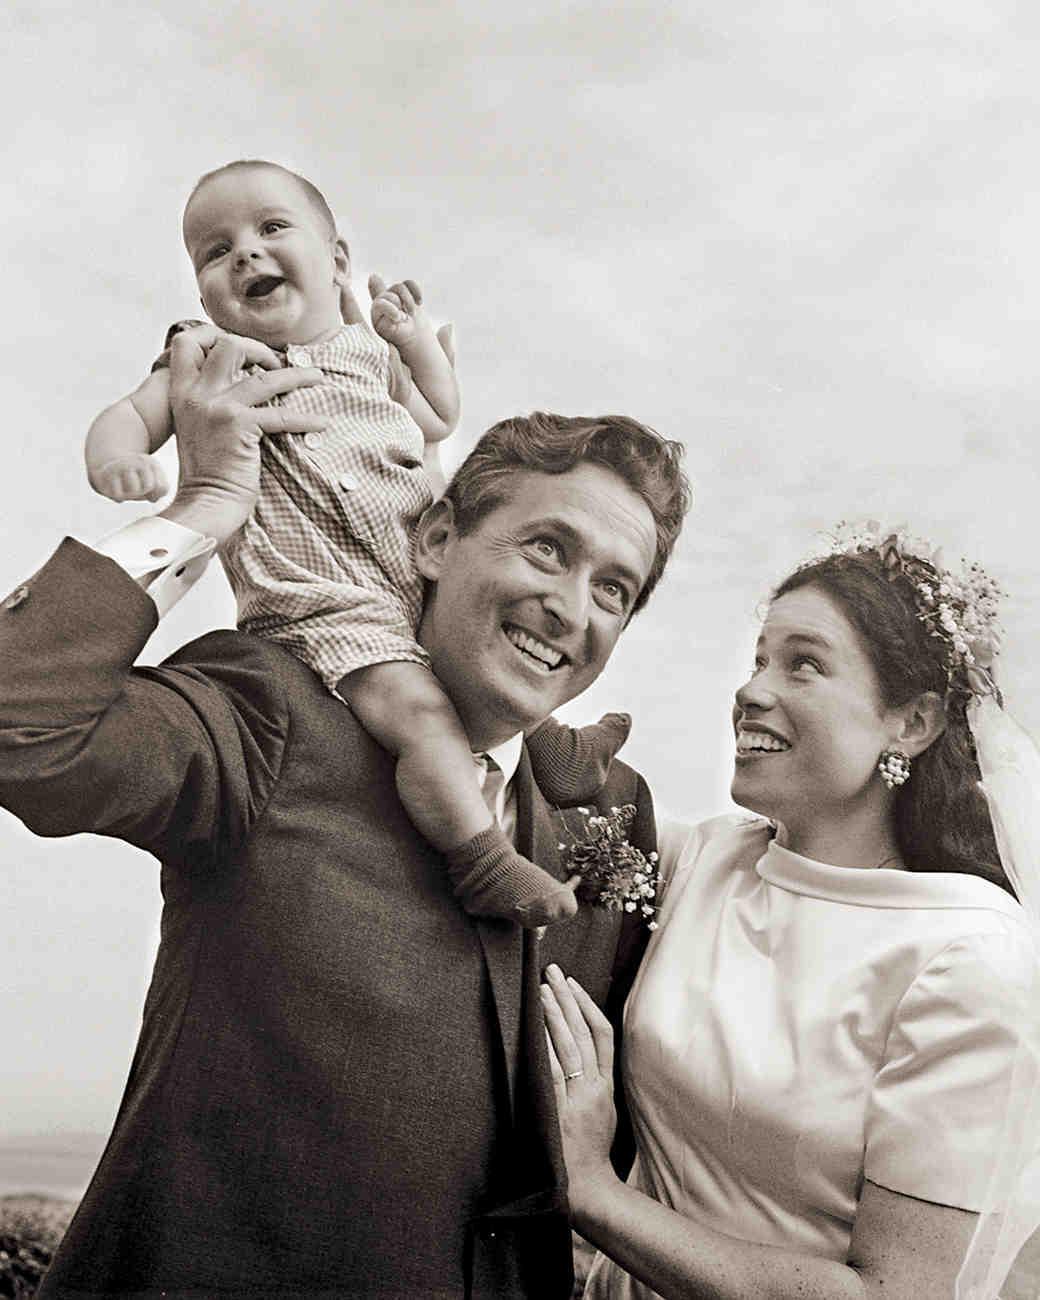 john-dolan-wedding-photographer-winter-spring-1995-0914.jpg